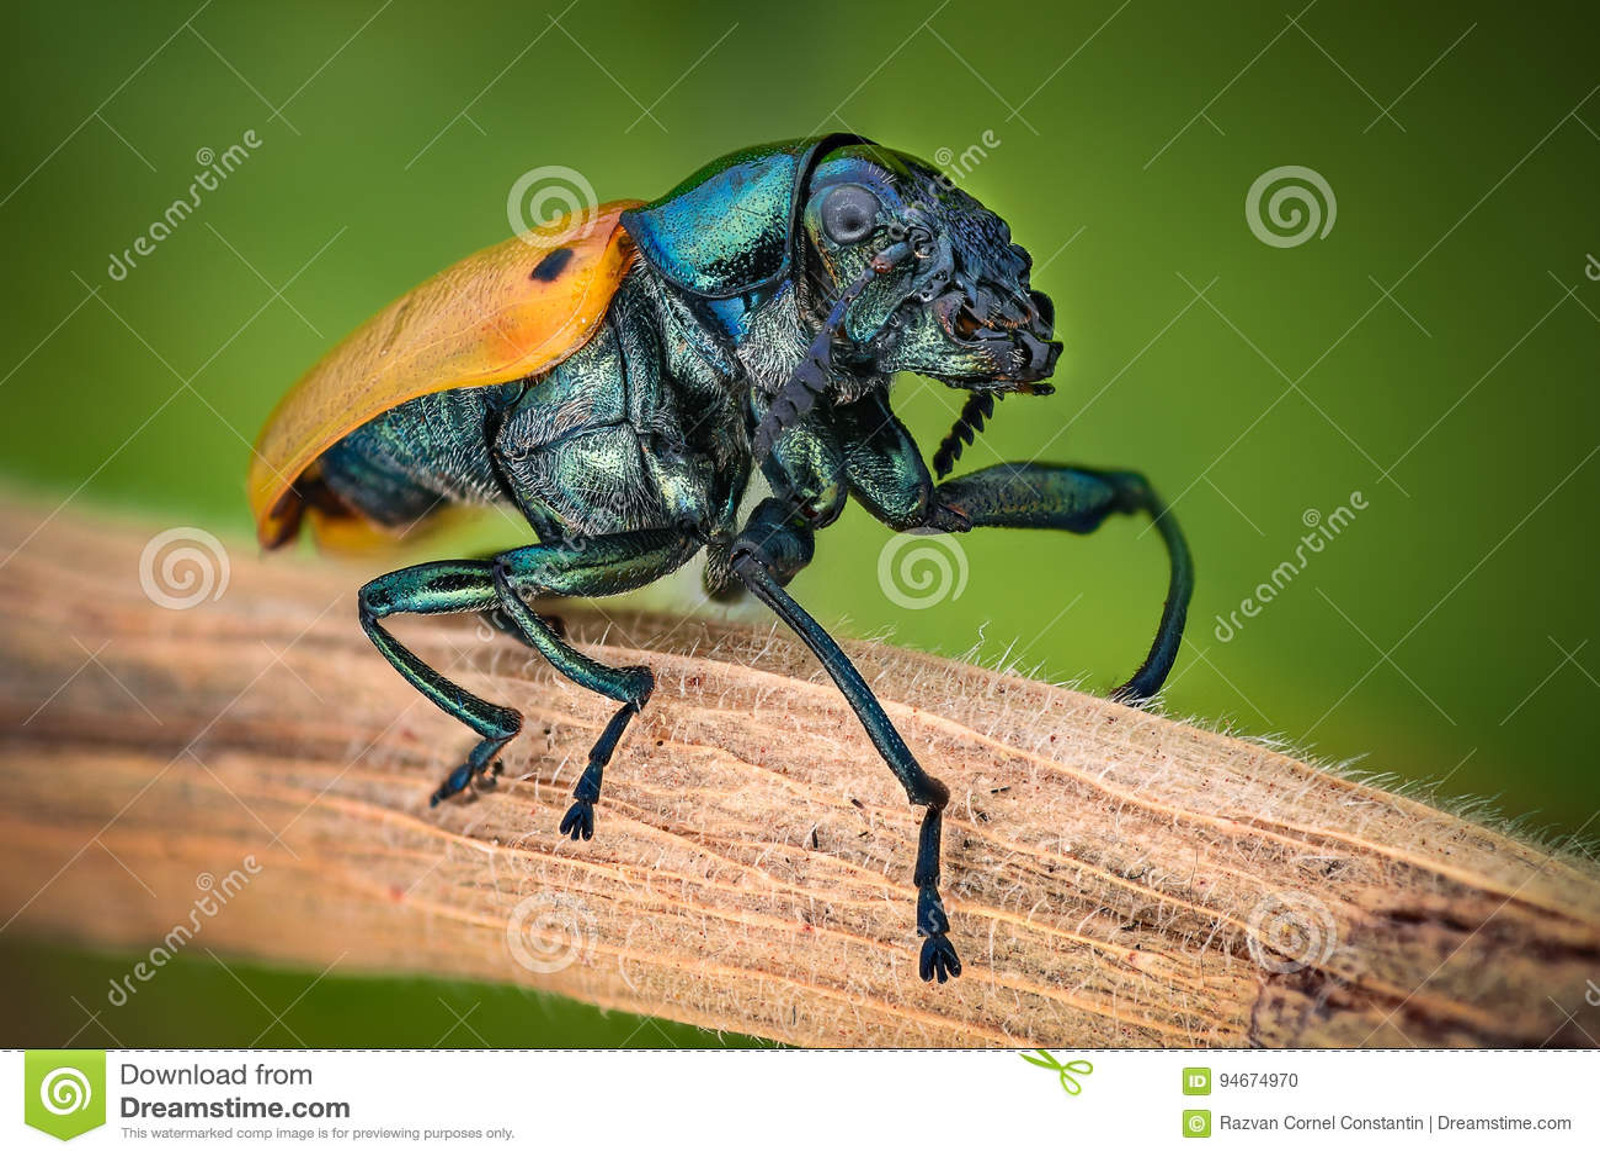 Extreme magnification - Jewel Beetle